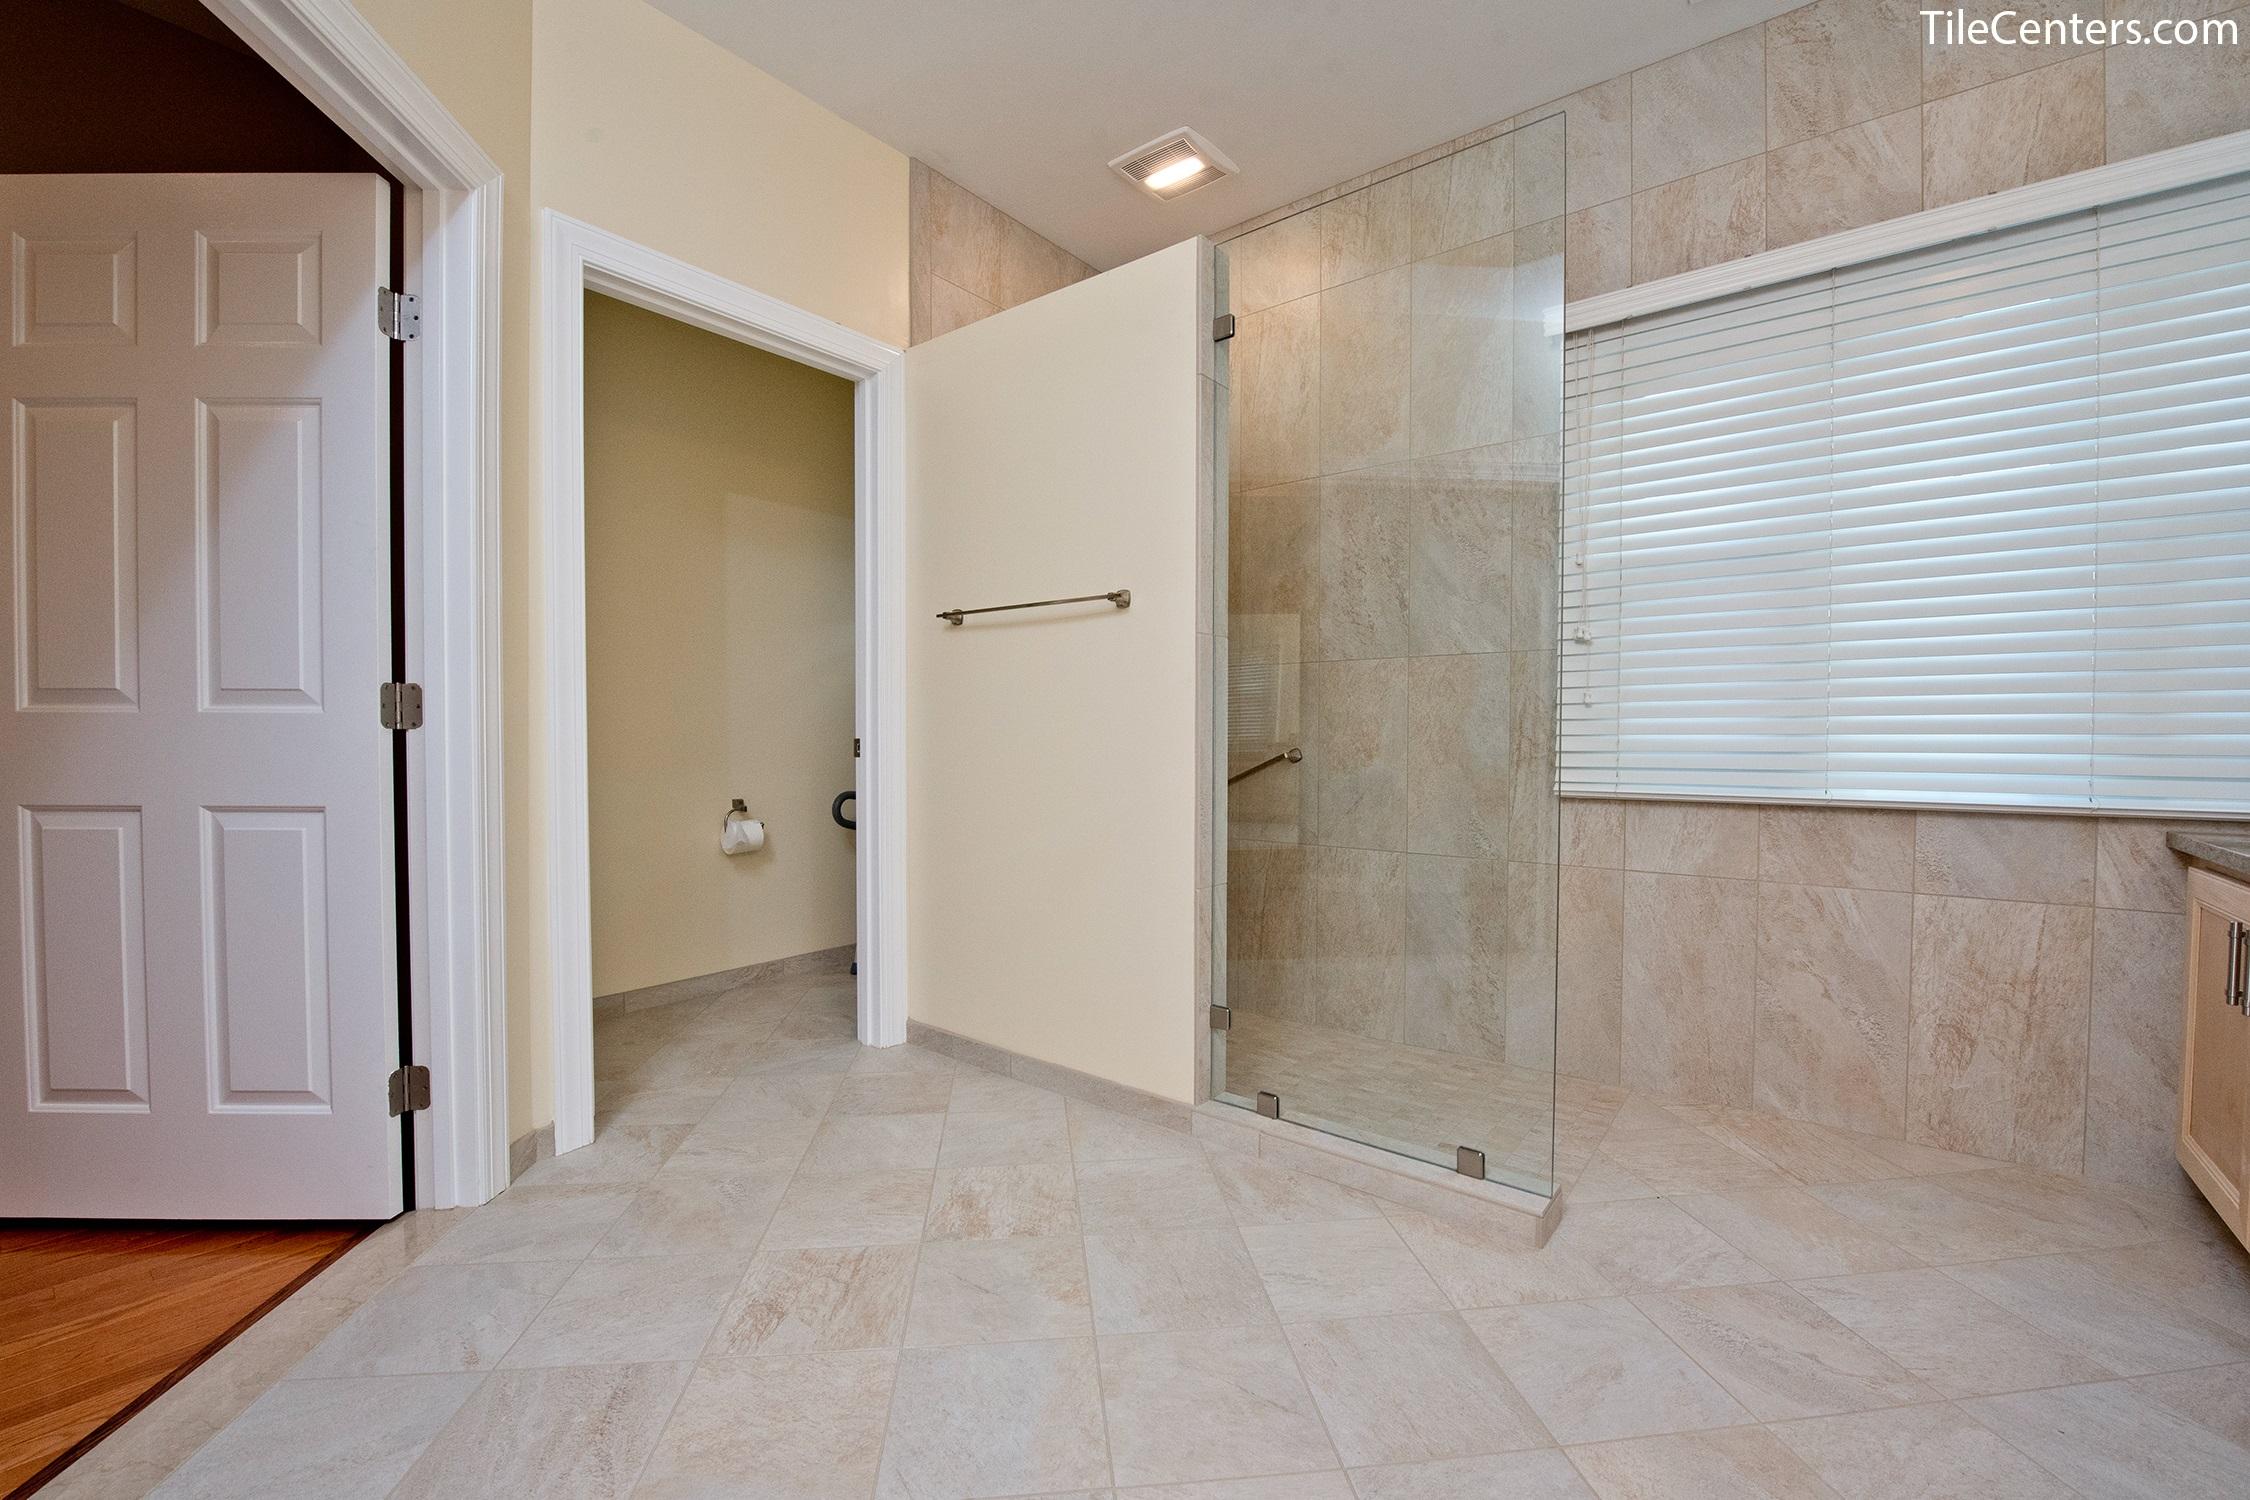 Bathroom Travener Cir Frederick MD Tile Center